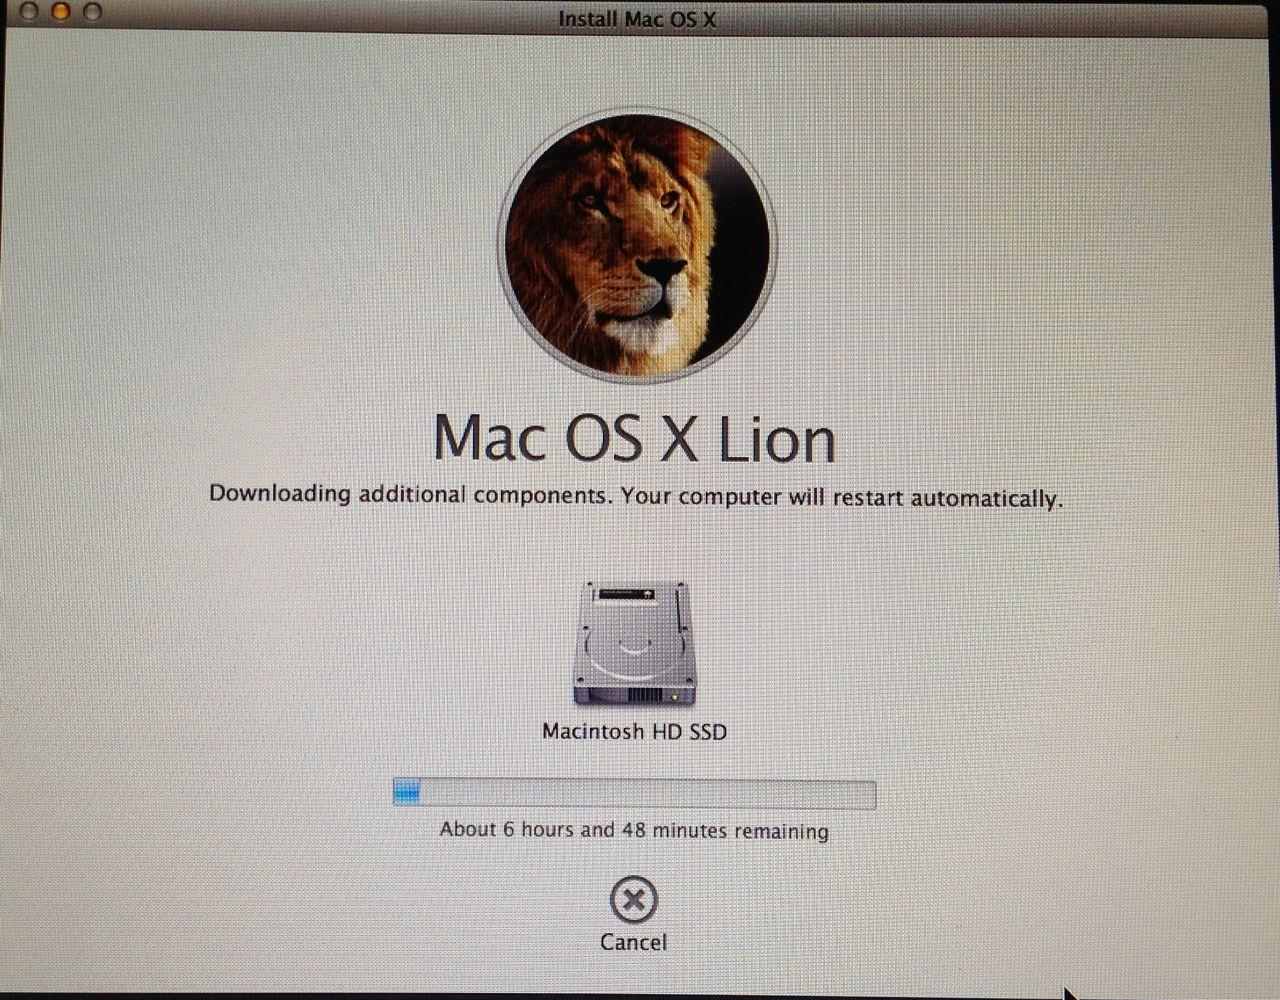 MacBook Pro Hibernation Wake-Up Crash Problems: Updating the